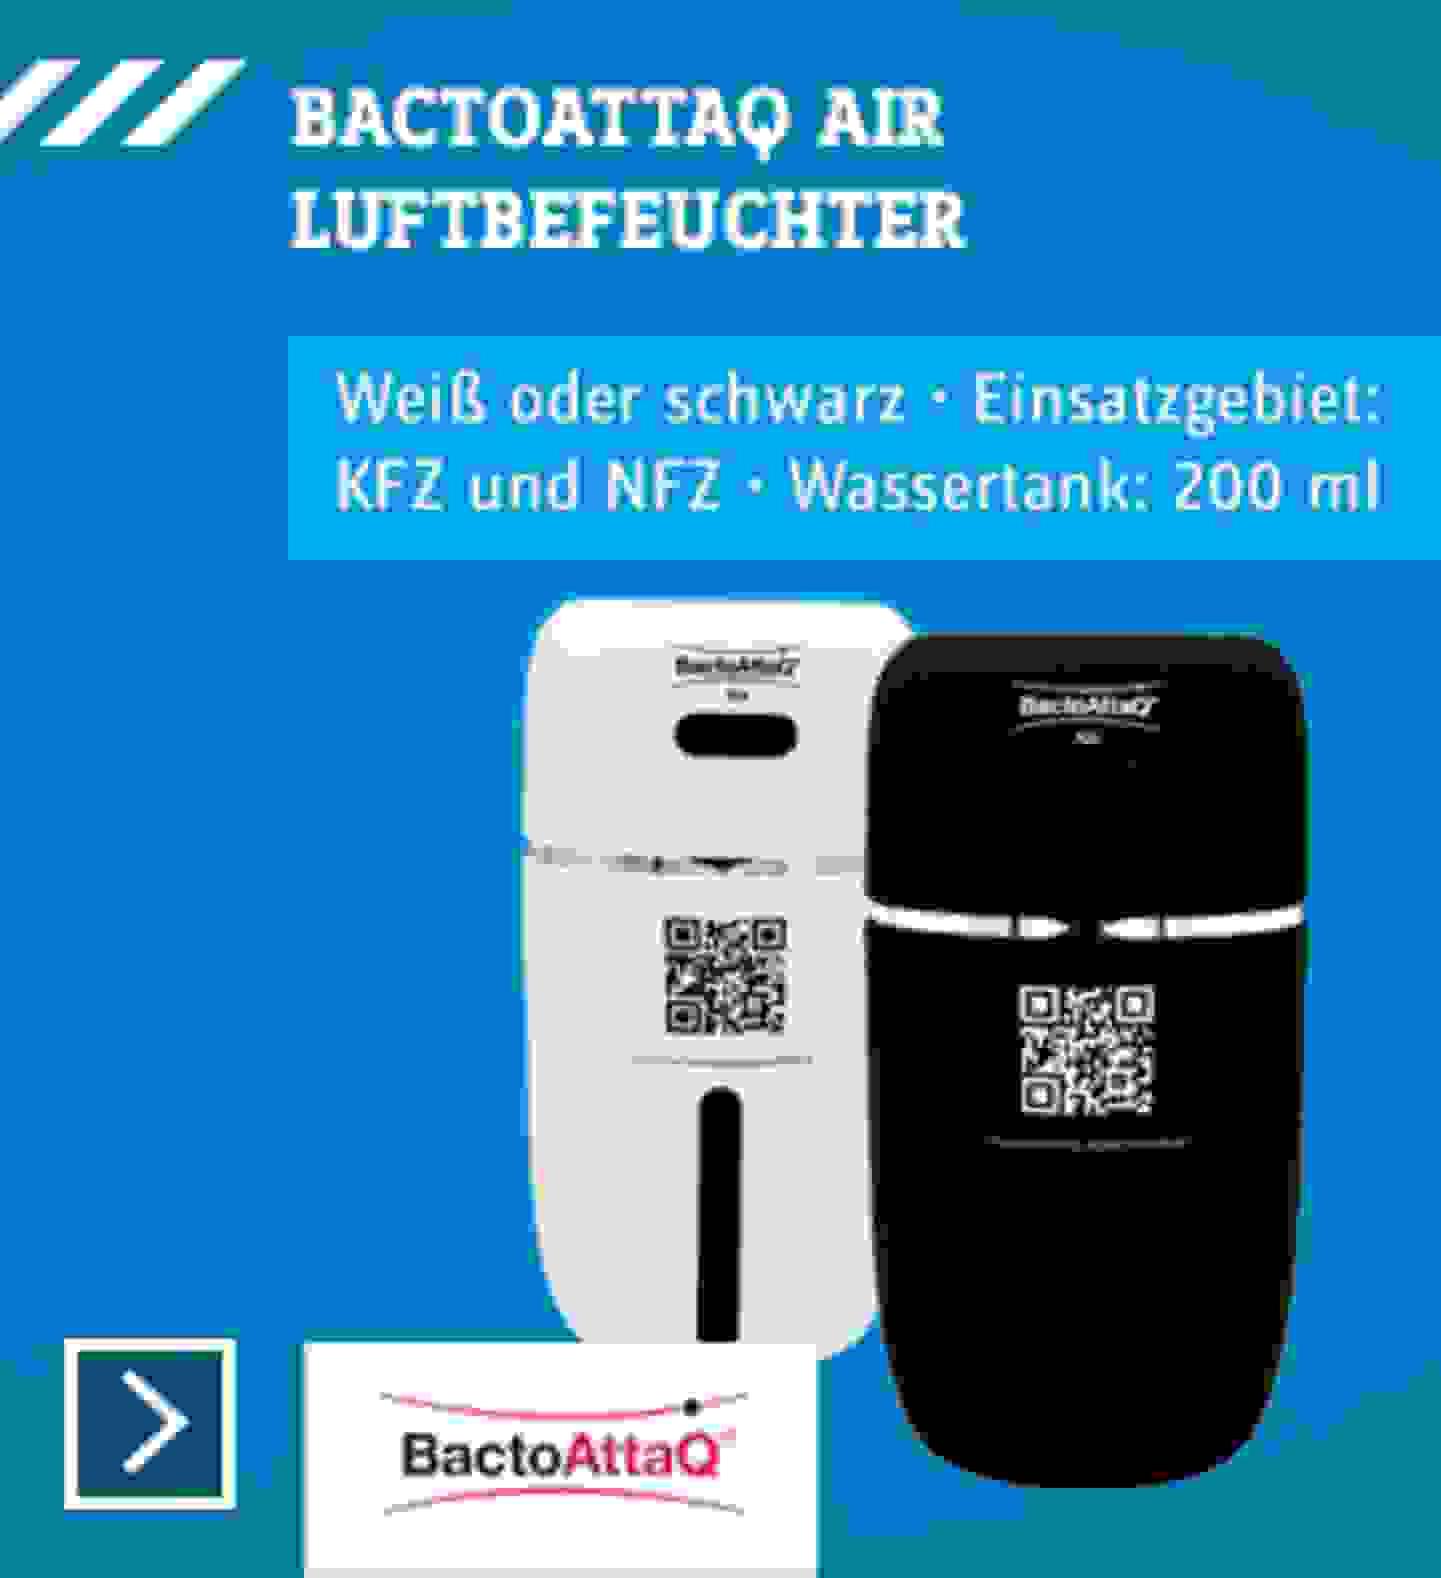 Bactoattaq Luftbefeuchter